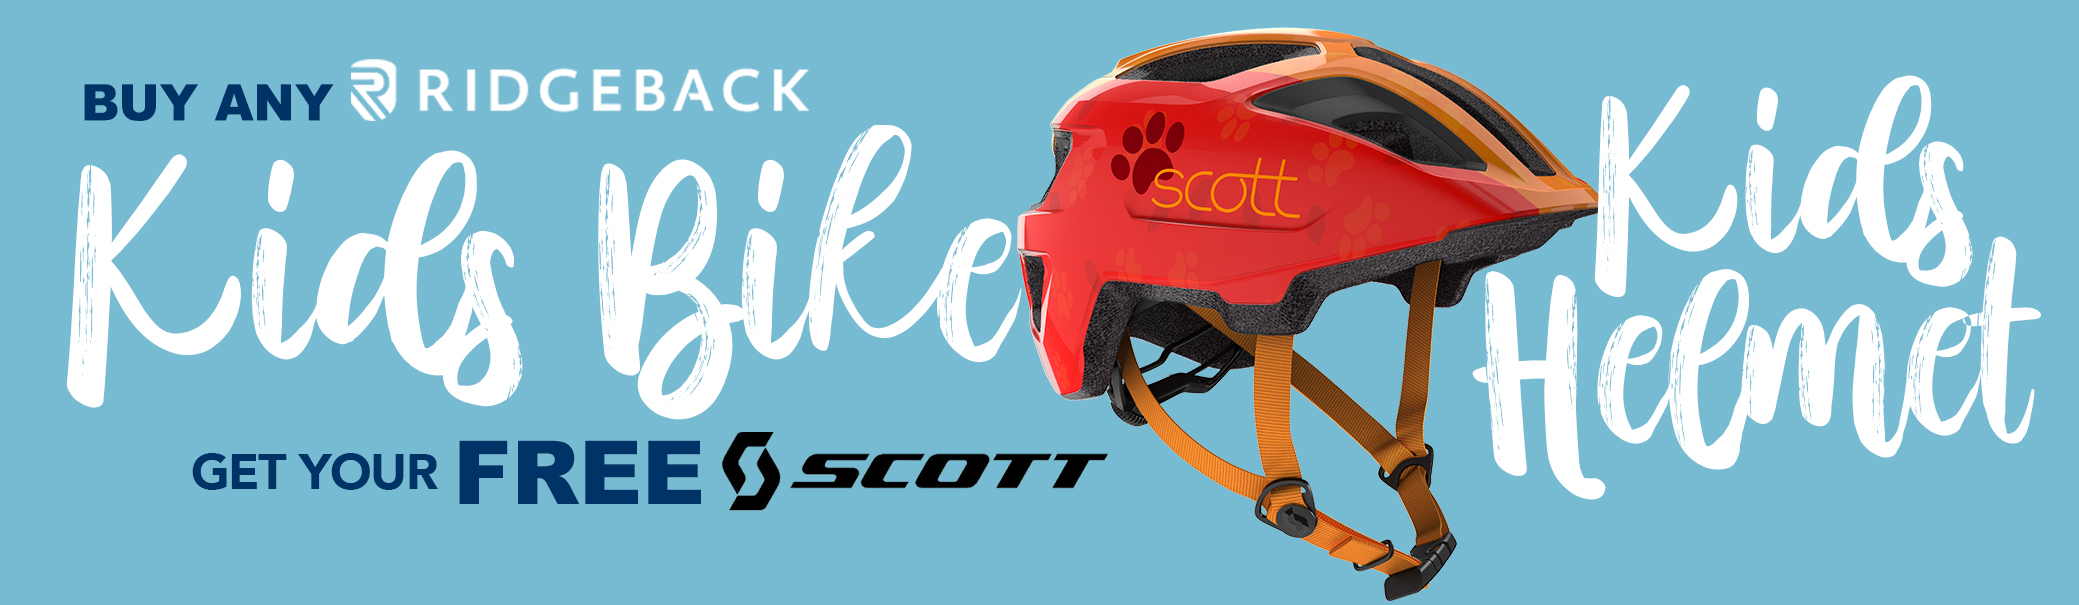 Ridgeback Kids Bikes Free Helmet Offer